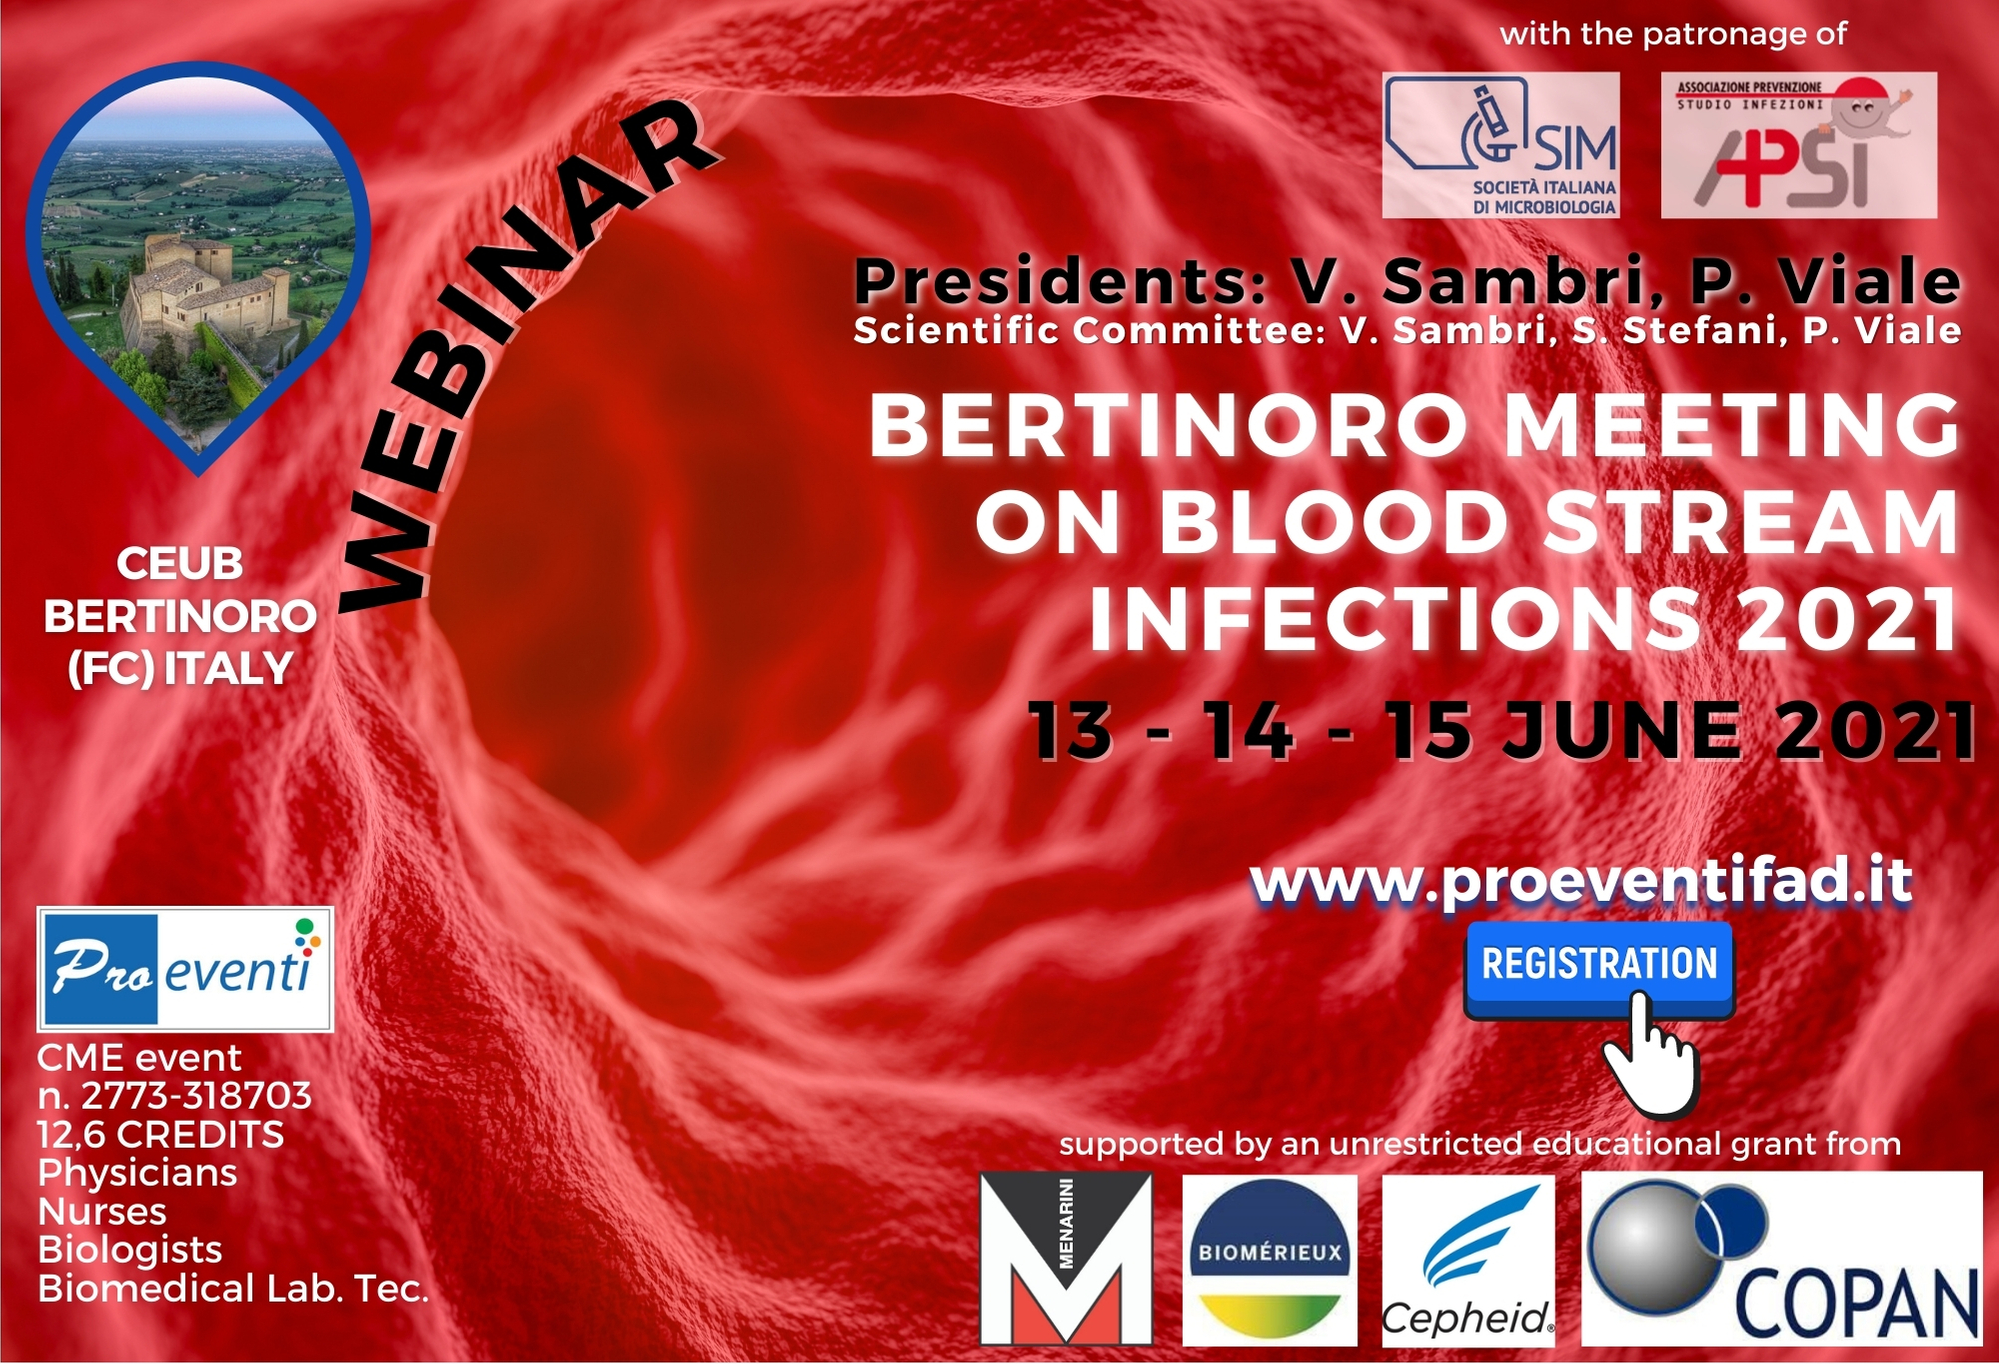 WEBINAR- BERTINORO MEETING ON BLOOD STREAM INFECTIONS 2021